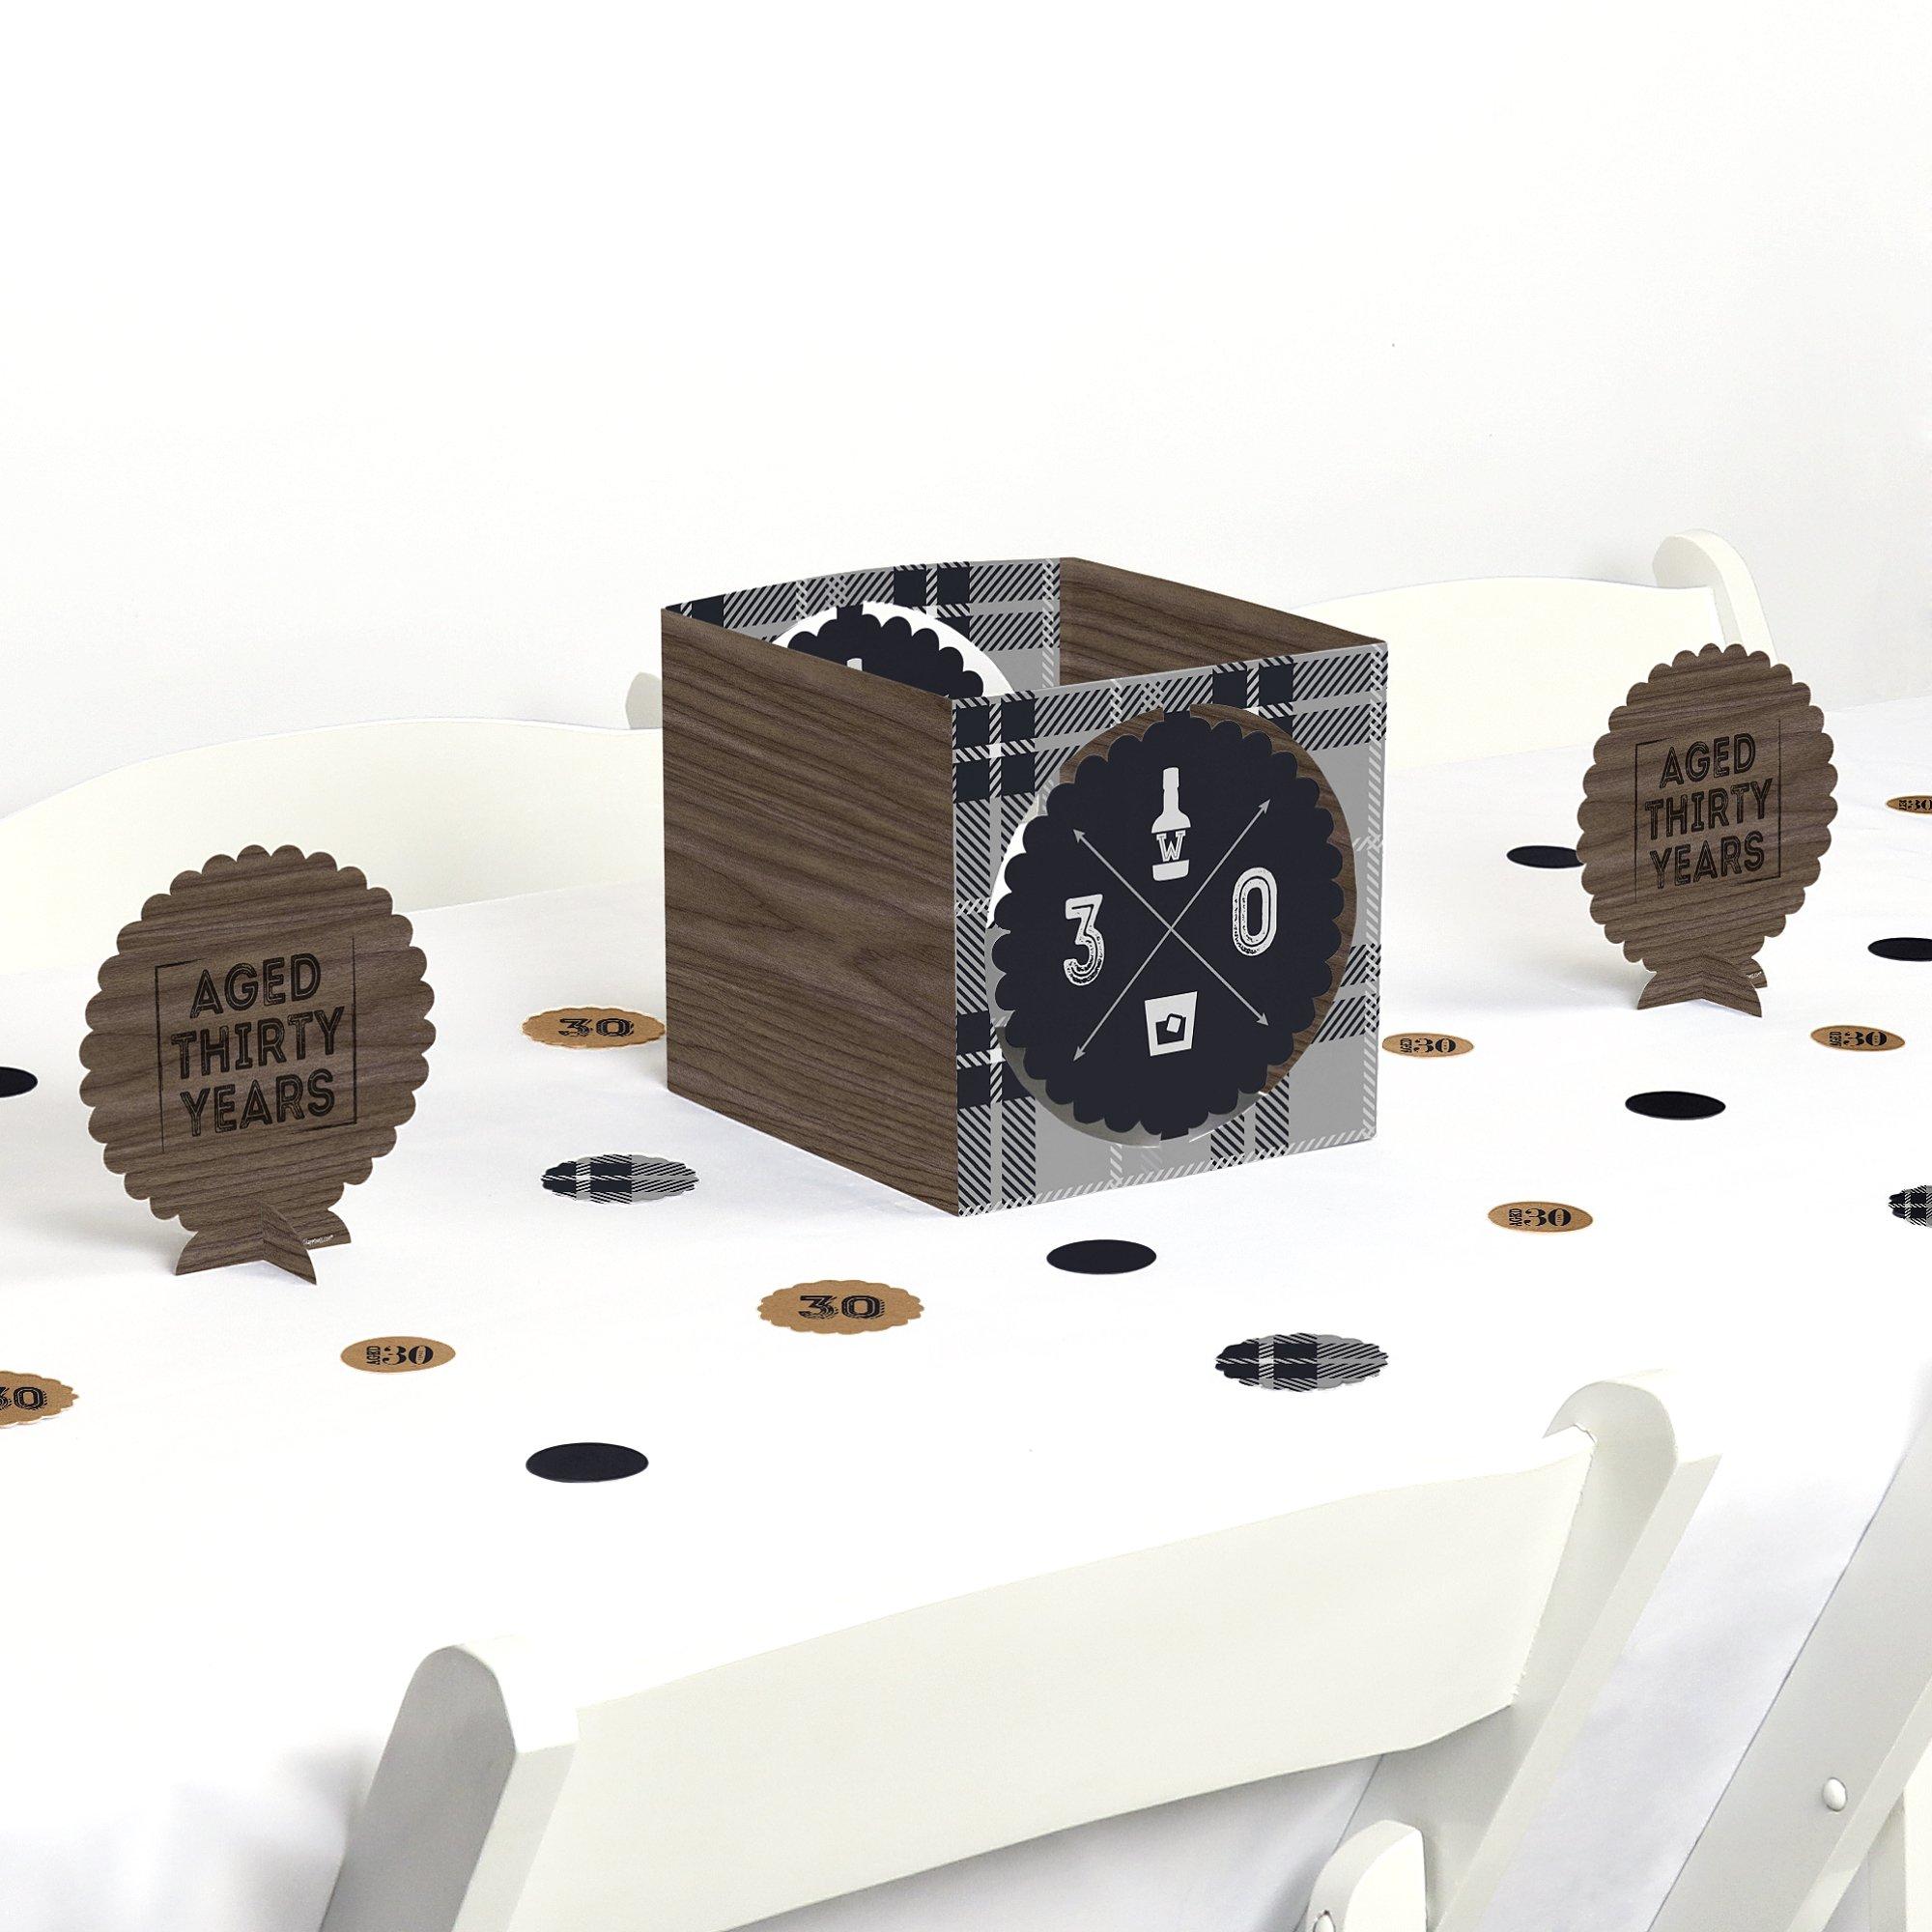 30th Milestone Birthday - Dashingly Aged to Perfection - Birthday Party Centerpiece & Table Decoration Kit